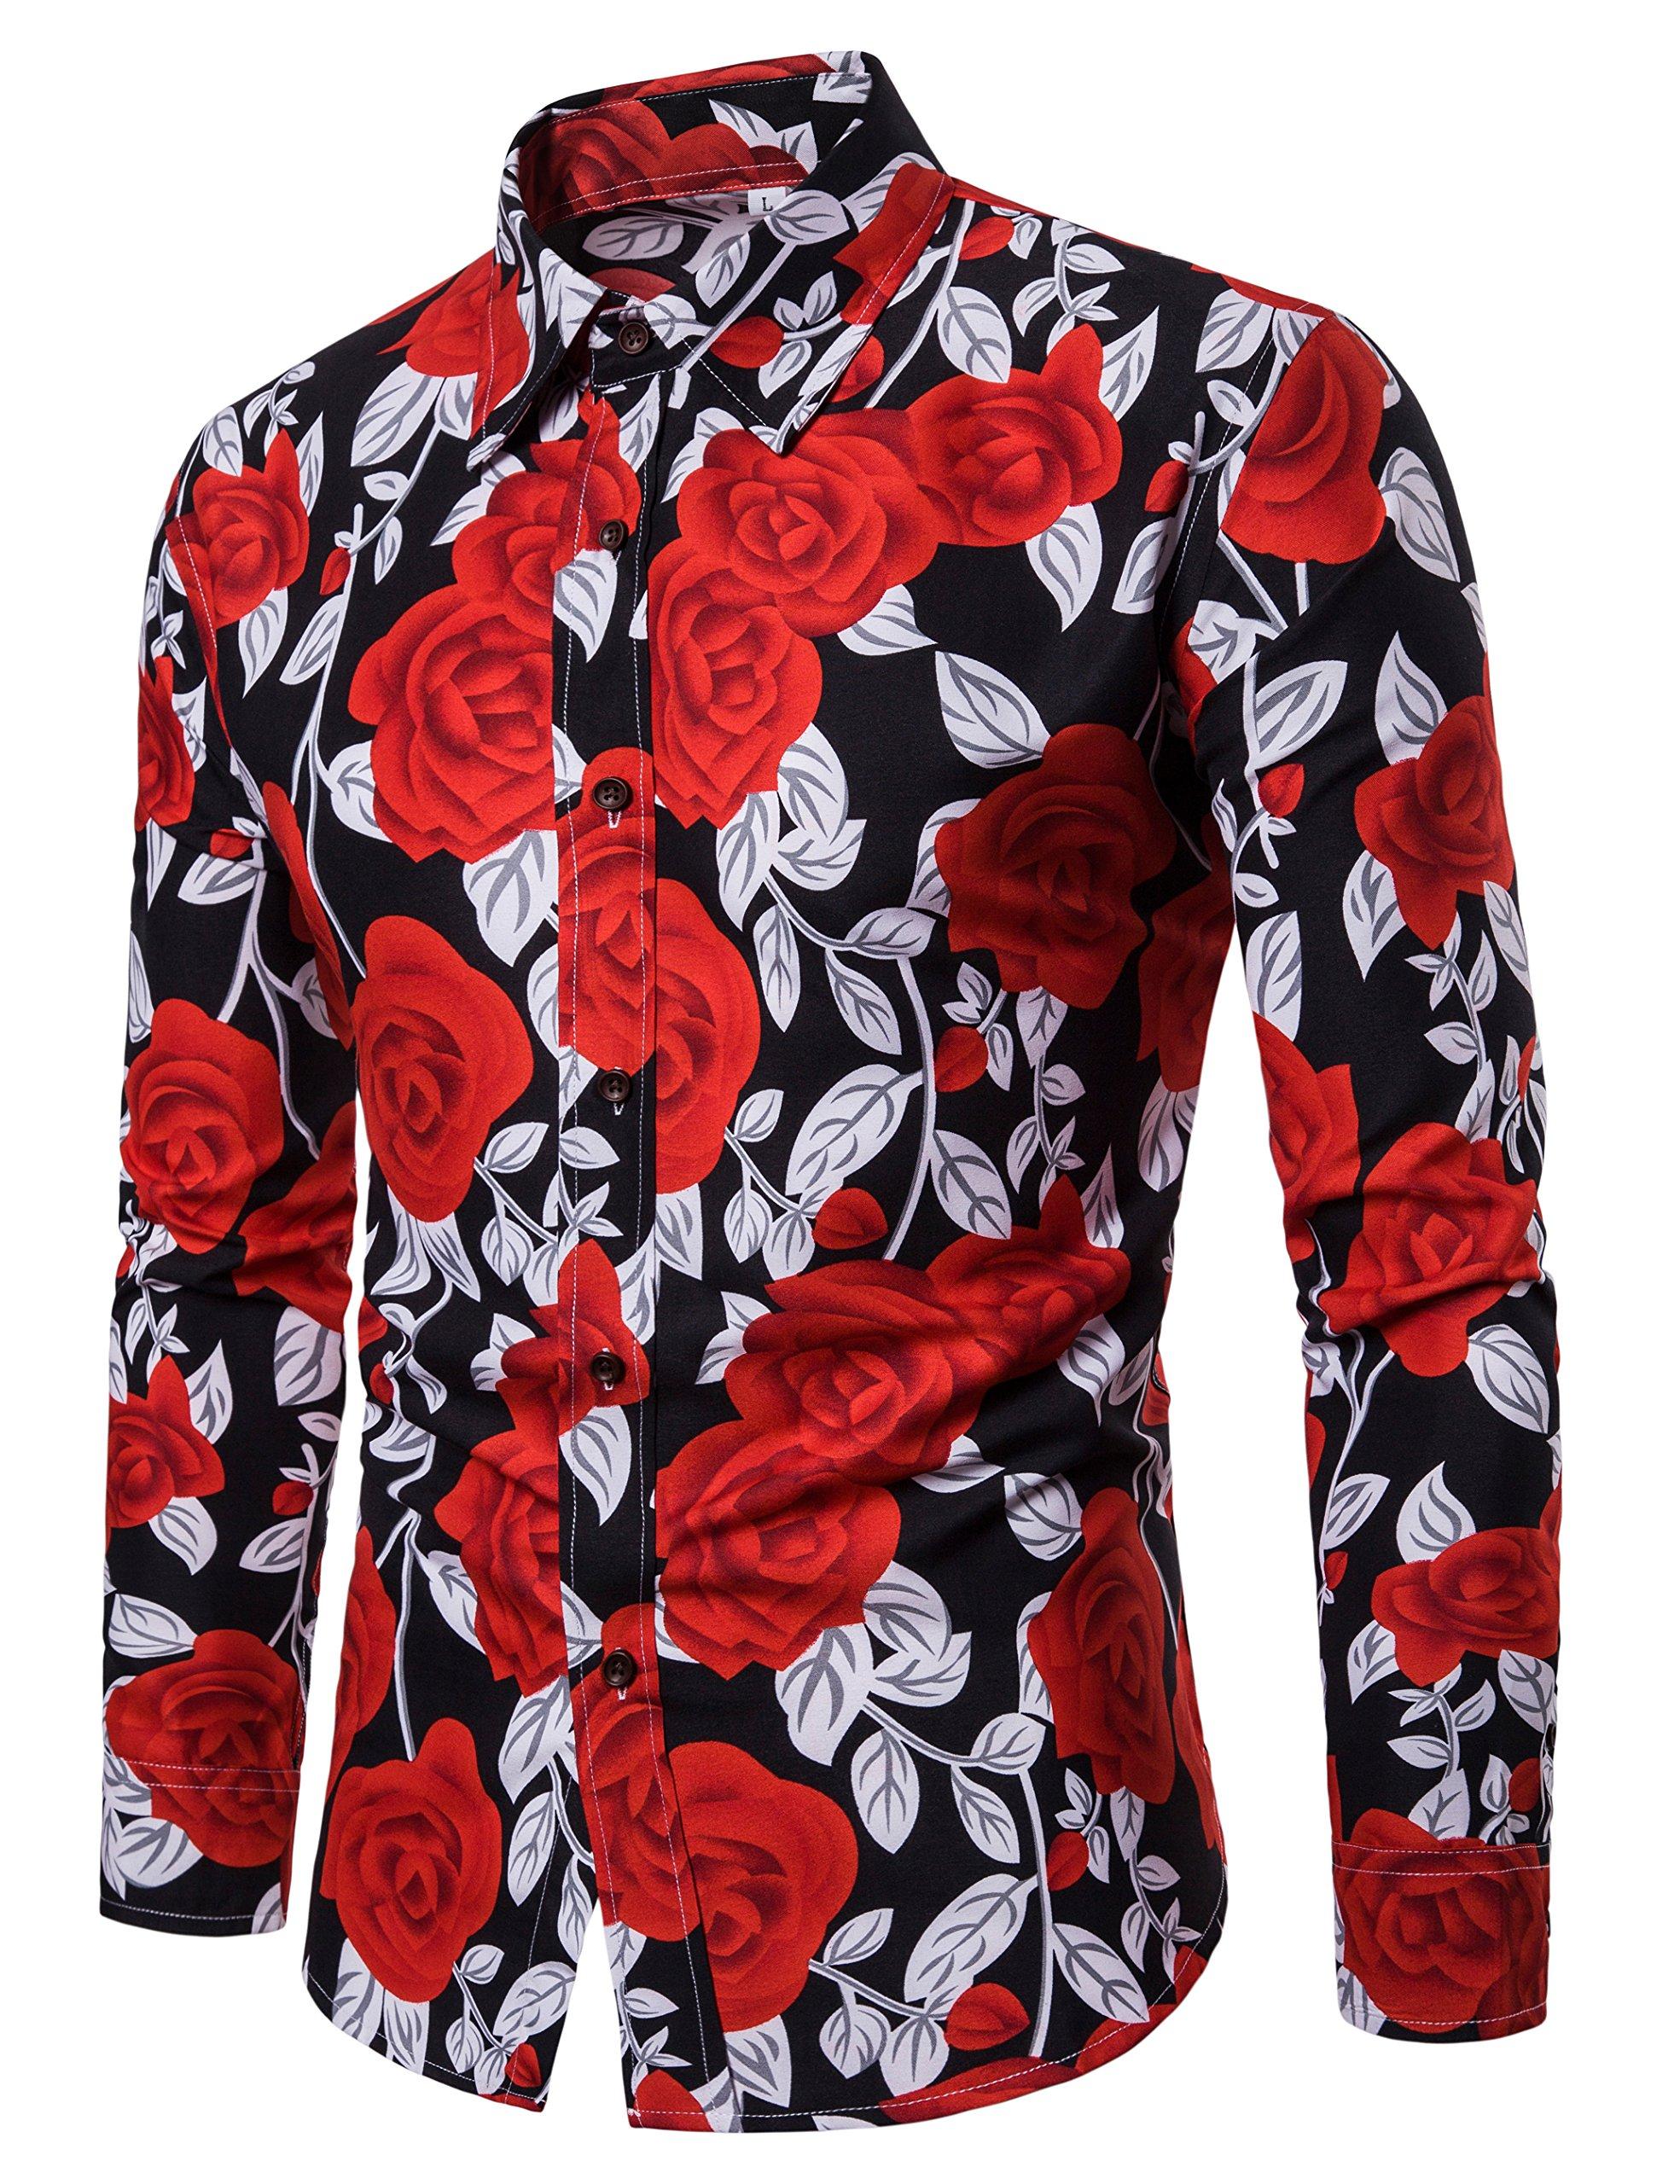 LEFTGU Men's Rose Flower Printed Summer Fashion Slim fit Button-Down Shirt